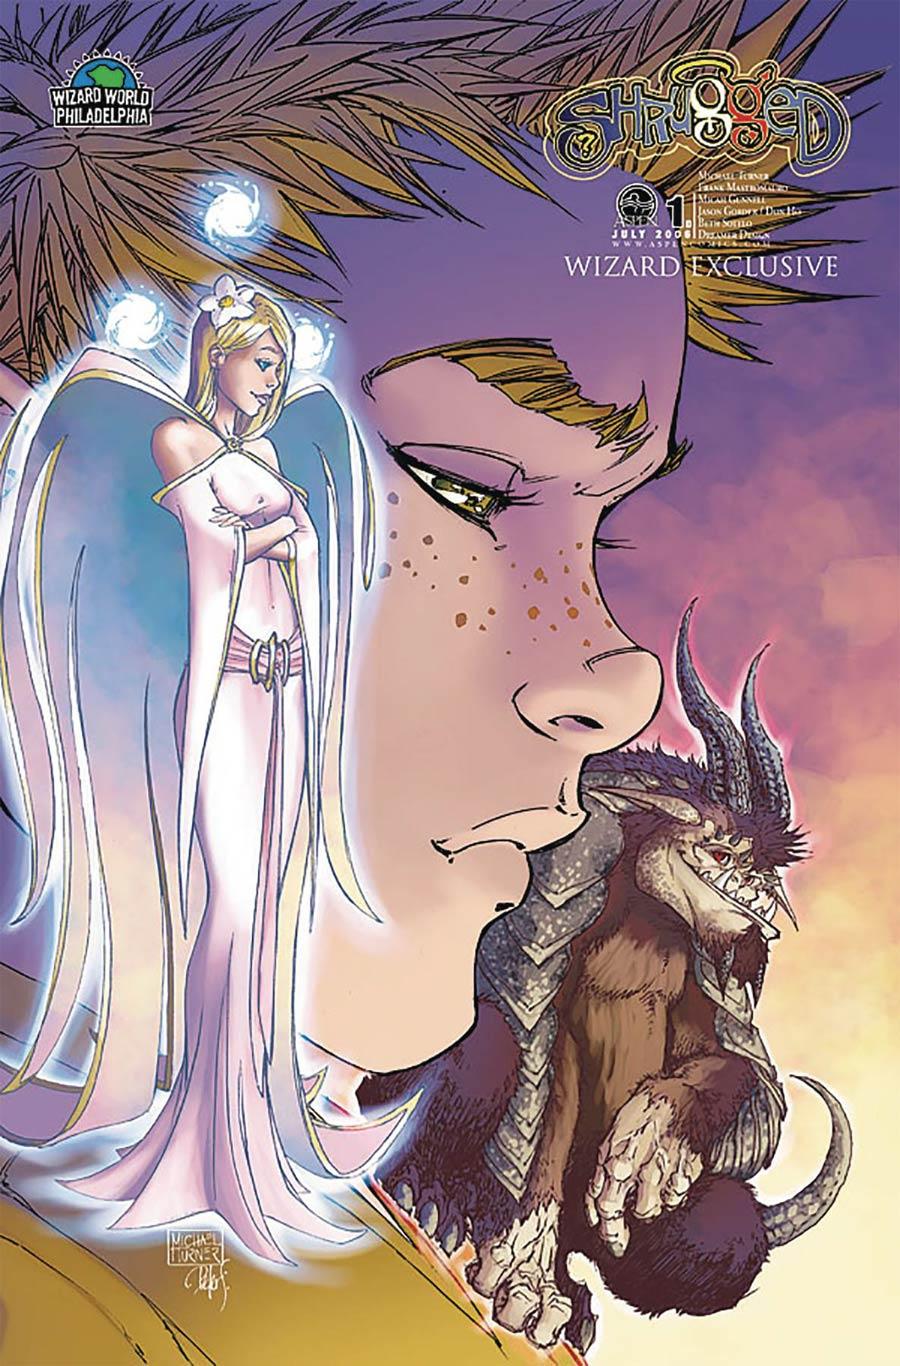 Shrugged #1 Cover E Wizard World Philadelphia 2006 Exclusive Michael Turner Variant Cover